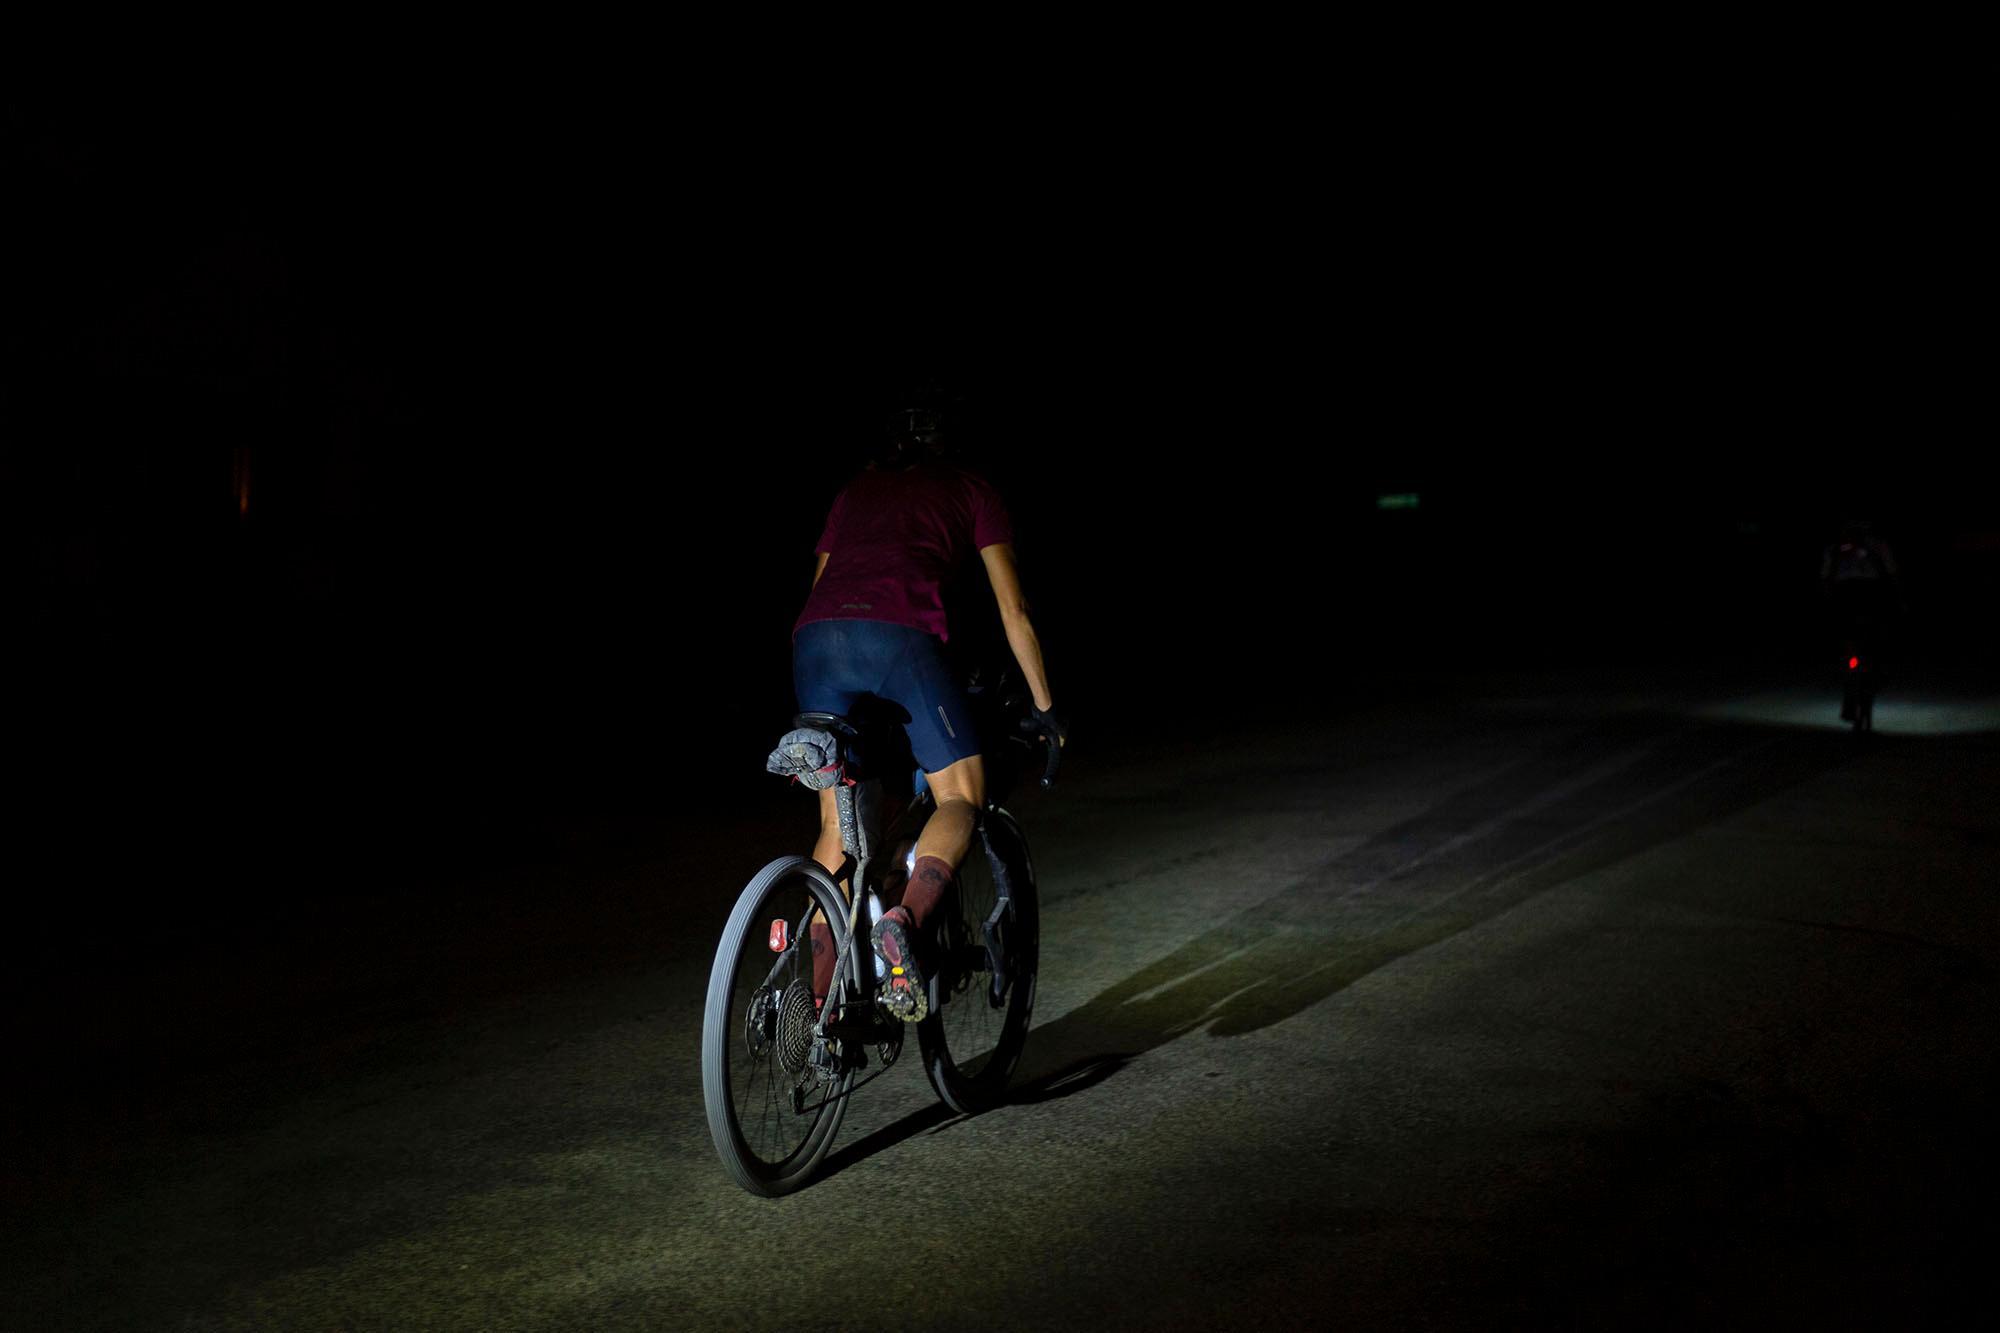 Riding the DKXL 2019 into the night. (Rugile Kaladyte)